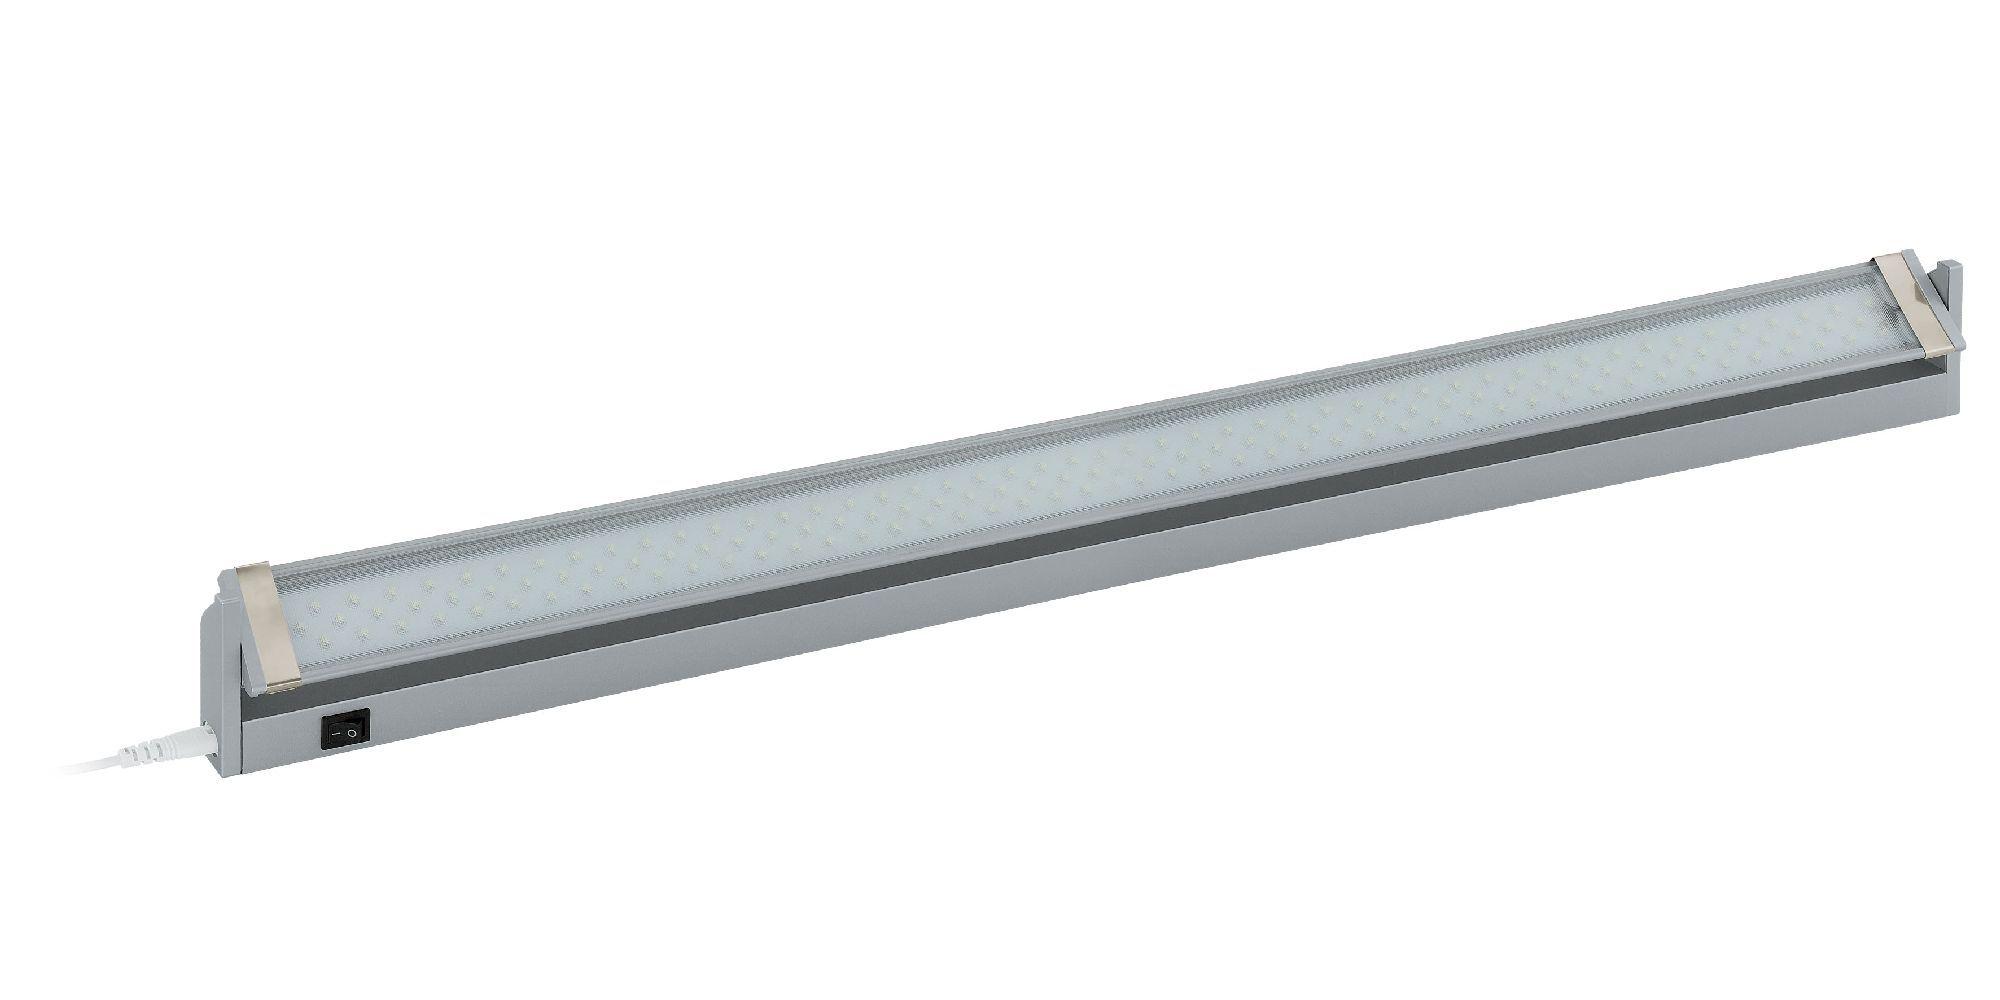 ... verlichting onder keukenkastjes. Led verlichting voor onder keukenkast